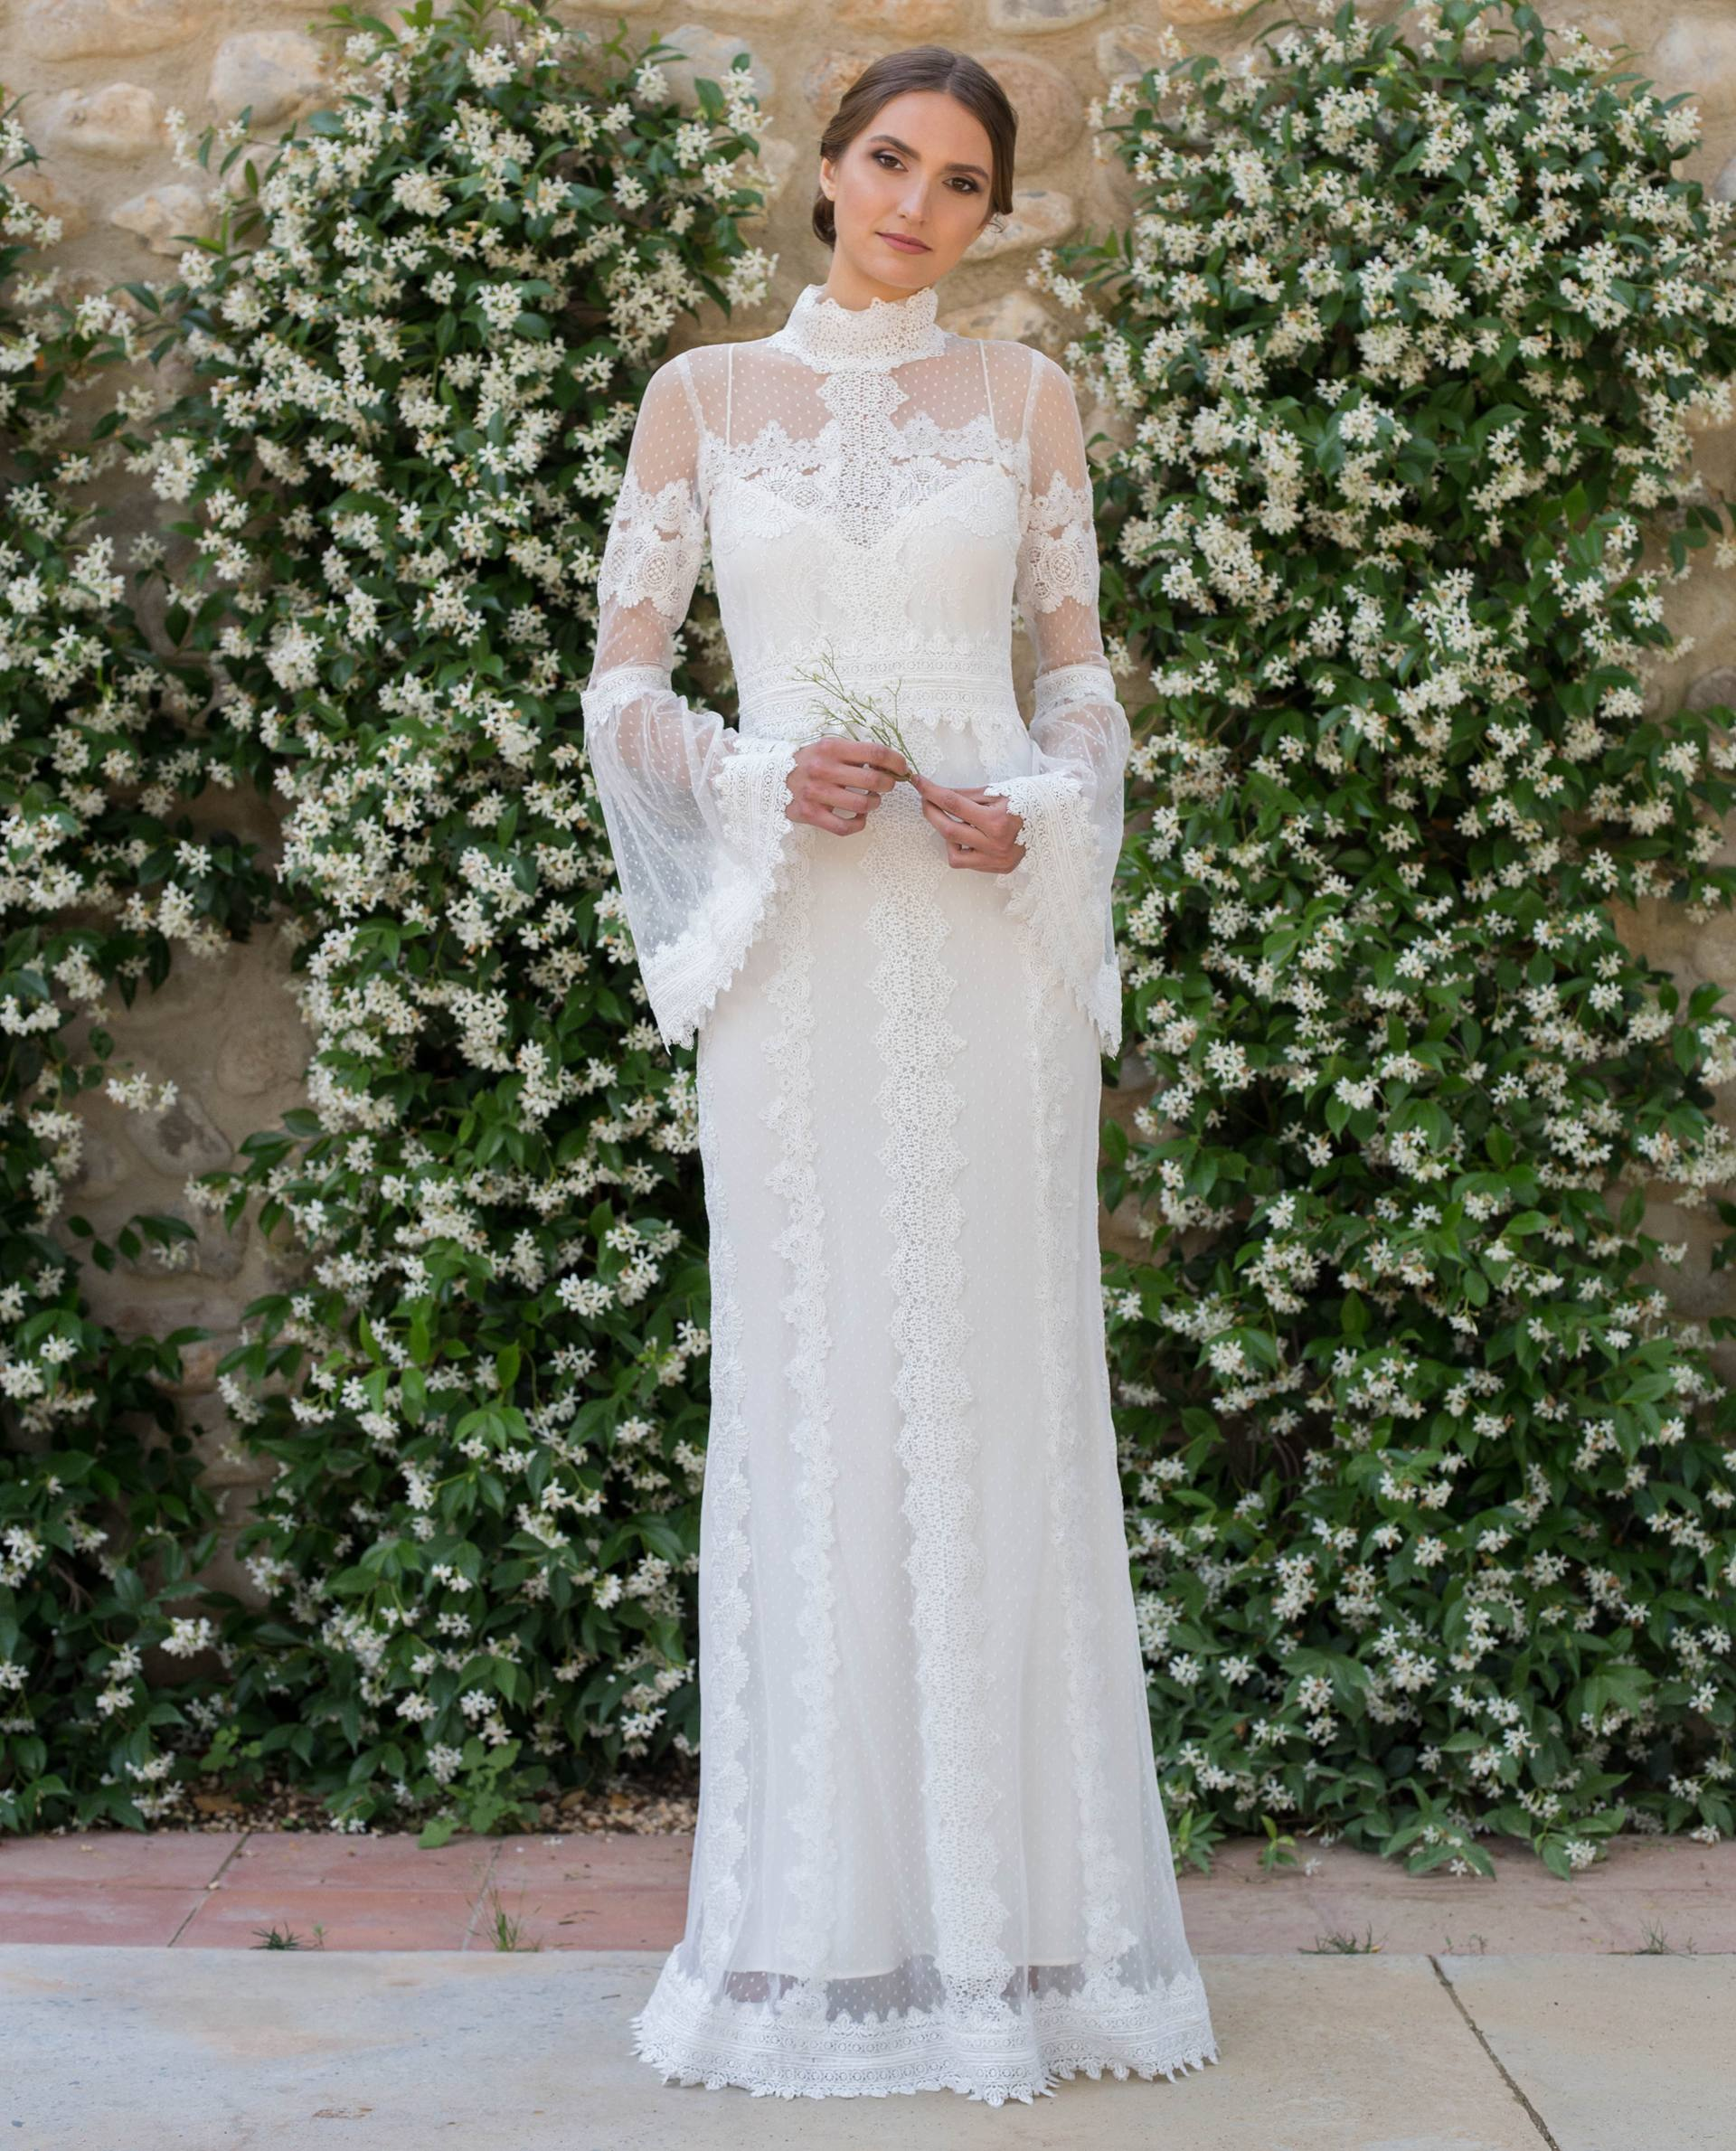 BRIDAL-NATURE 2018/19 - VESTIDOS - vestido novia Julia